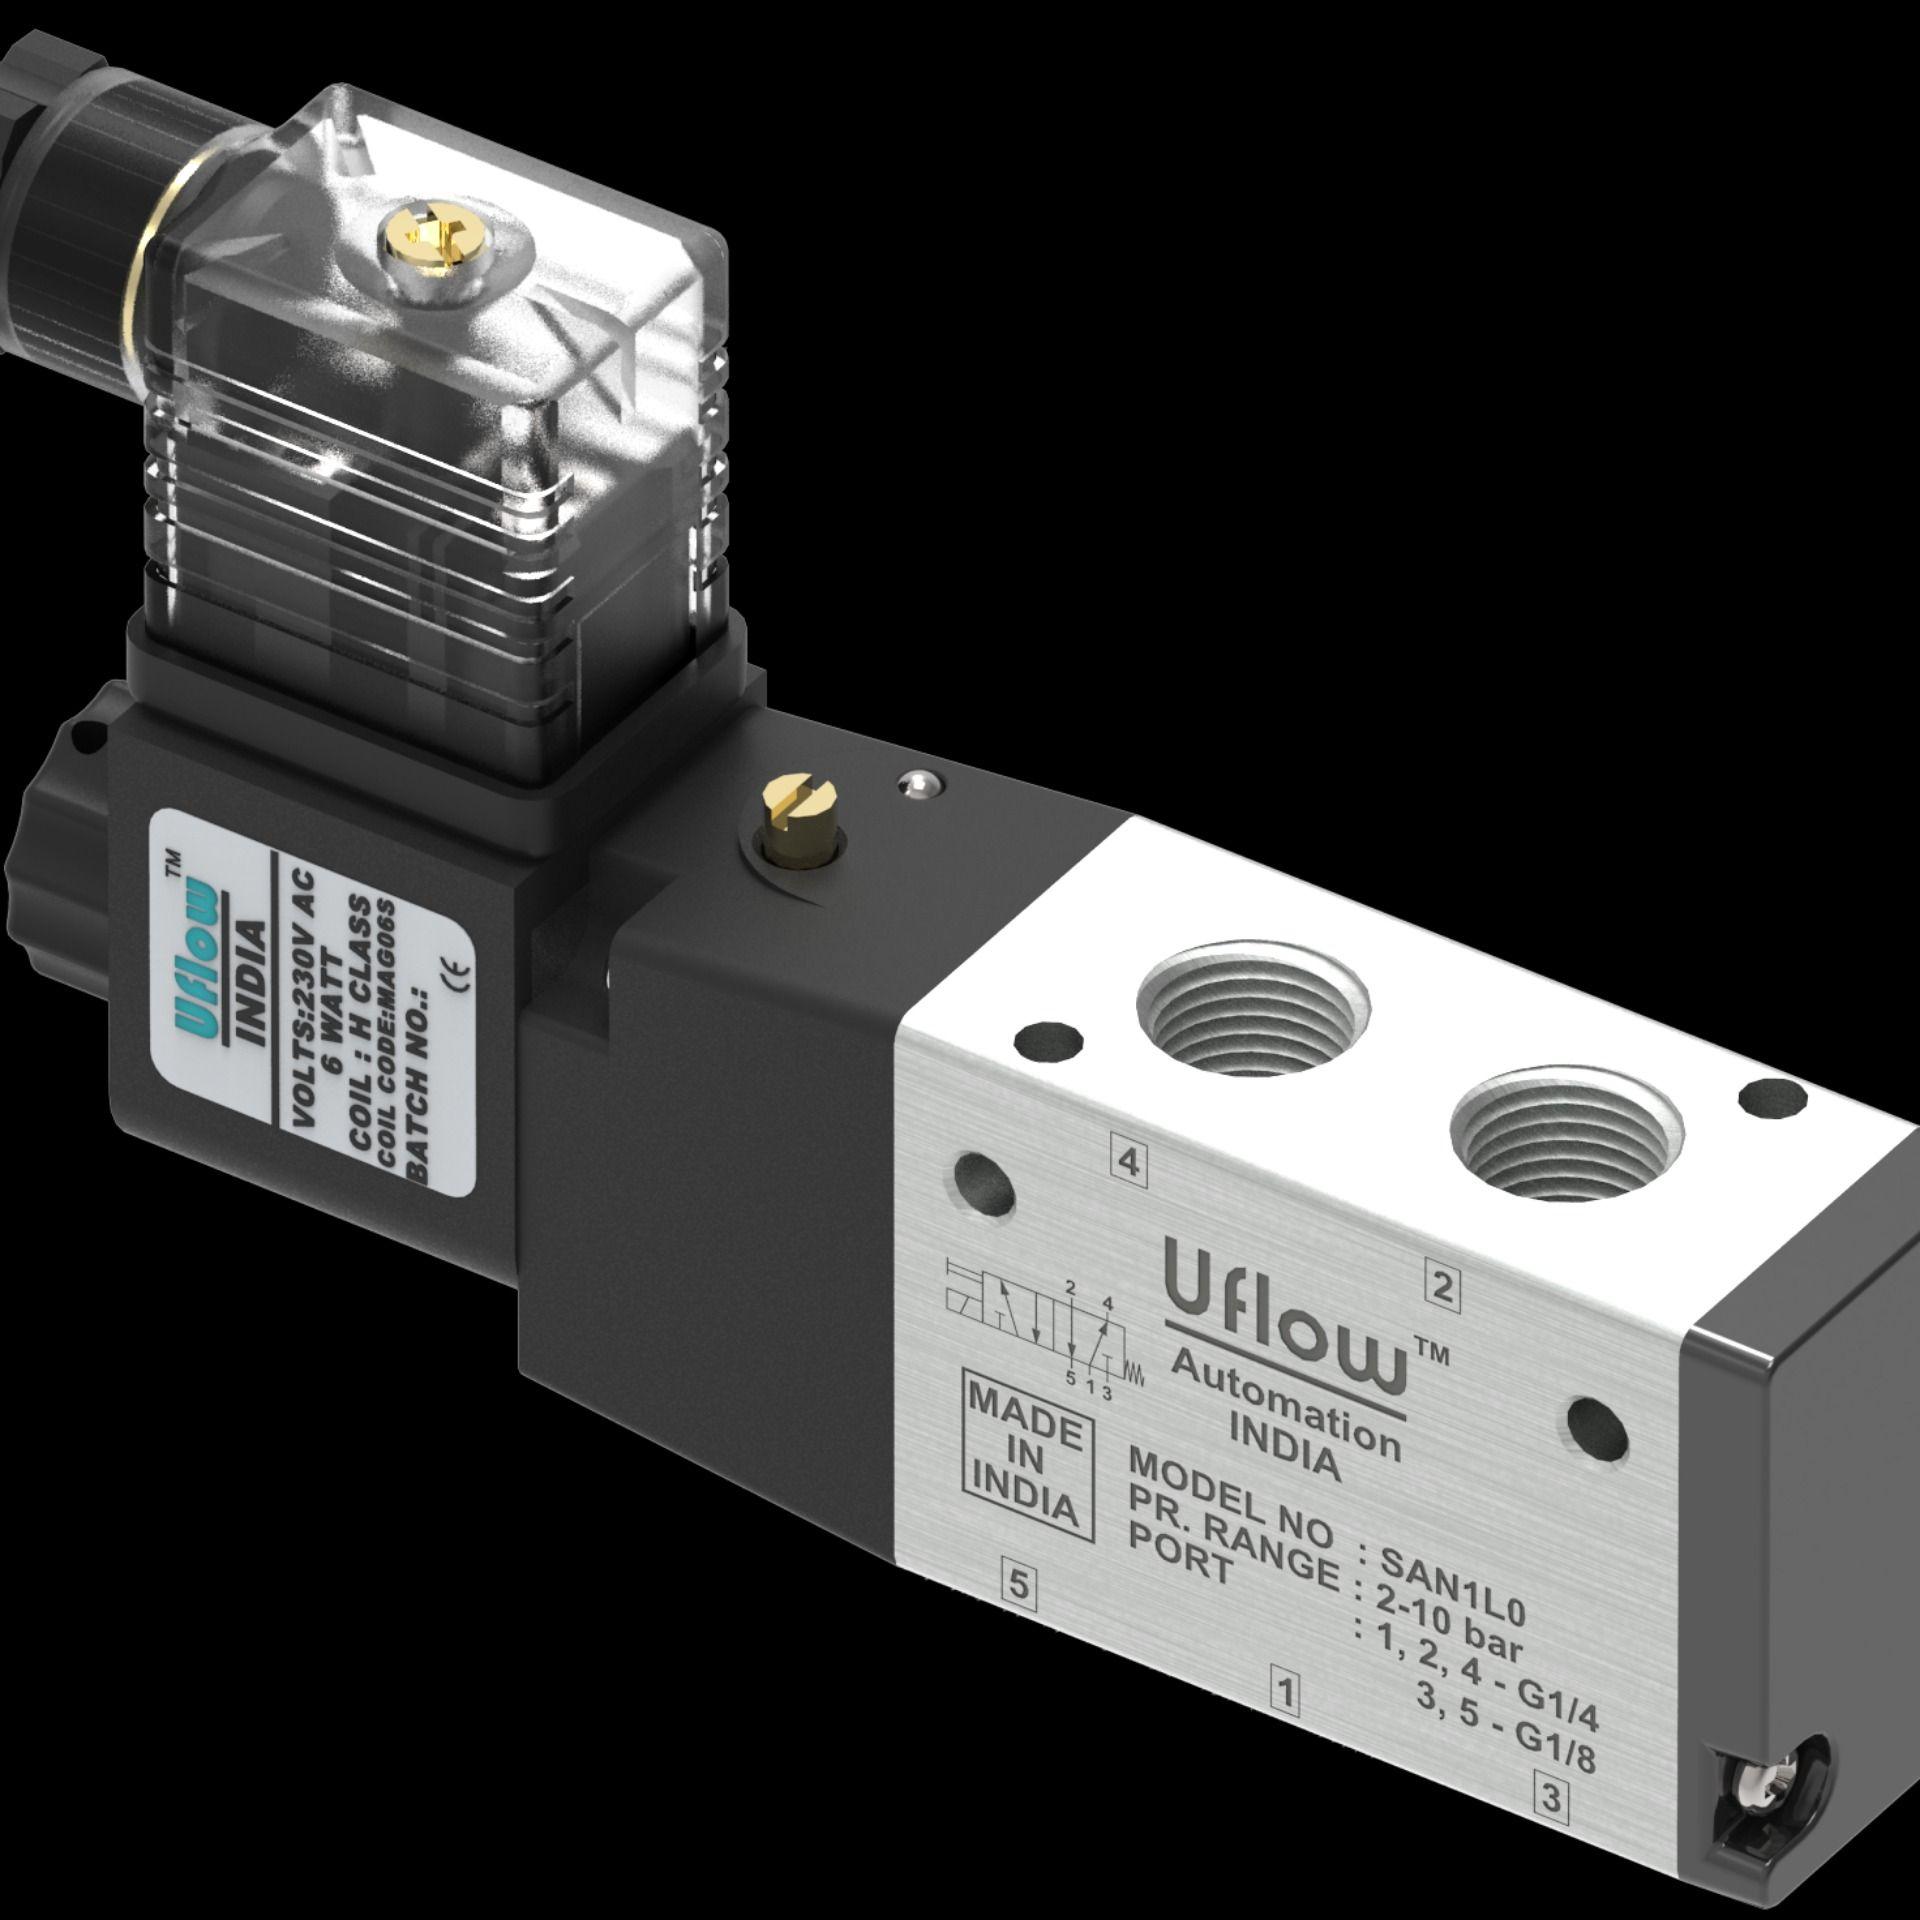 Solenoid Valves Valve, Control valves, Compressed air